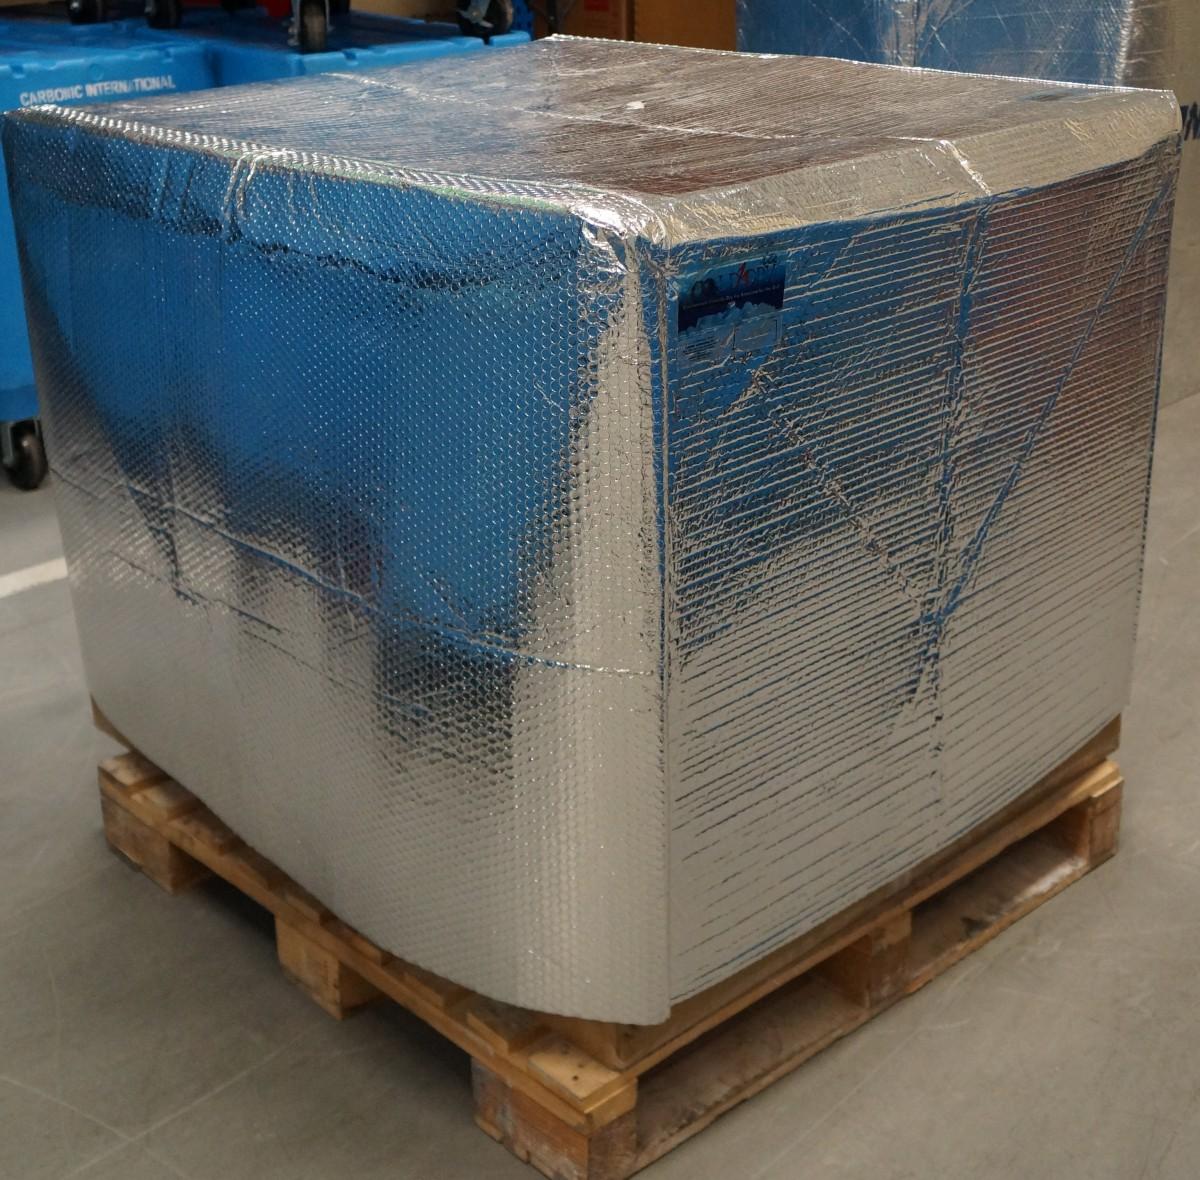 Temperature Insulated Cover For Medicines Vacker Uae